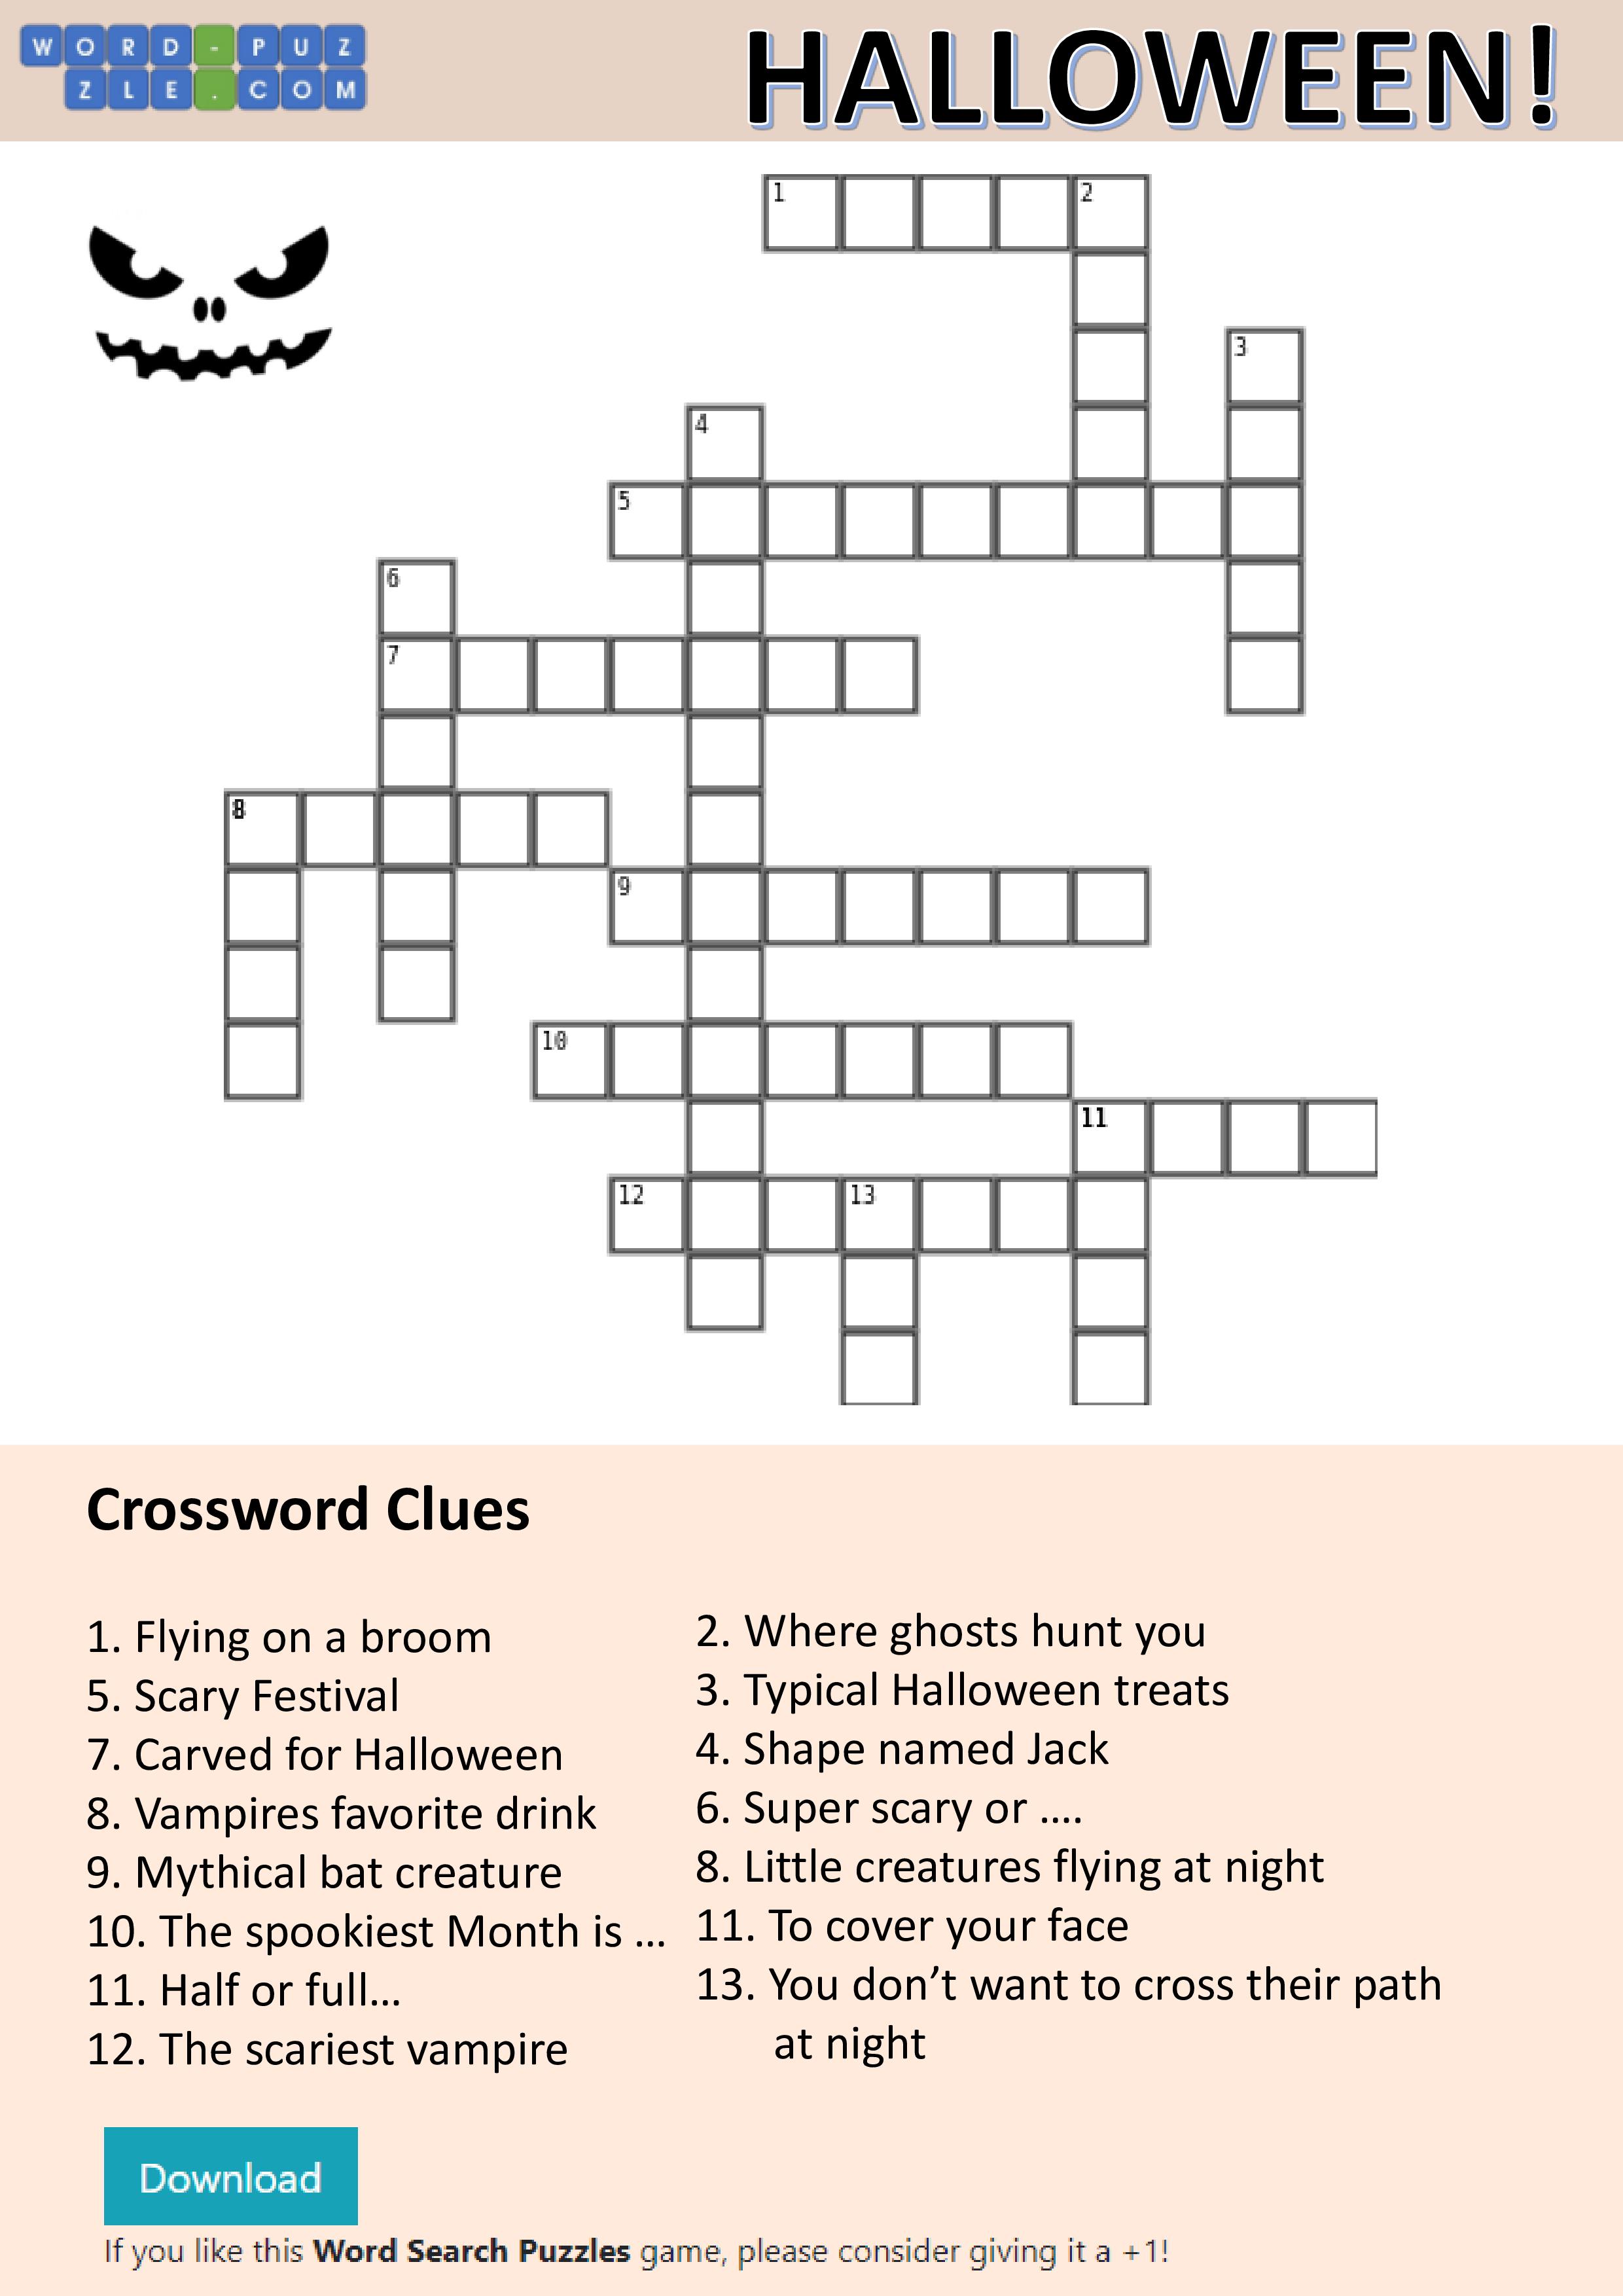 Free Halloween Crossword   Templates at allbusinesstemplates.com